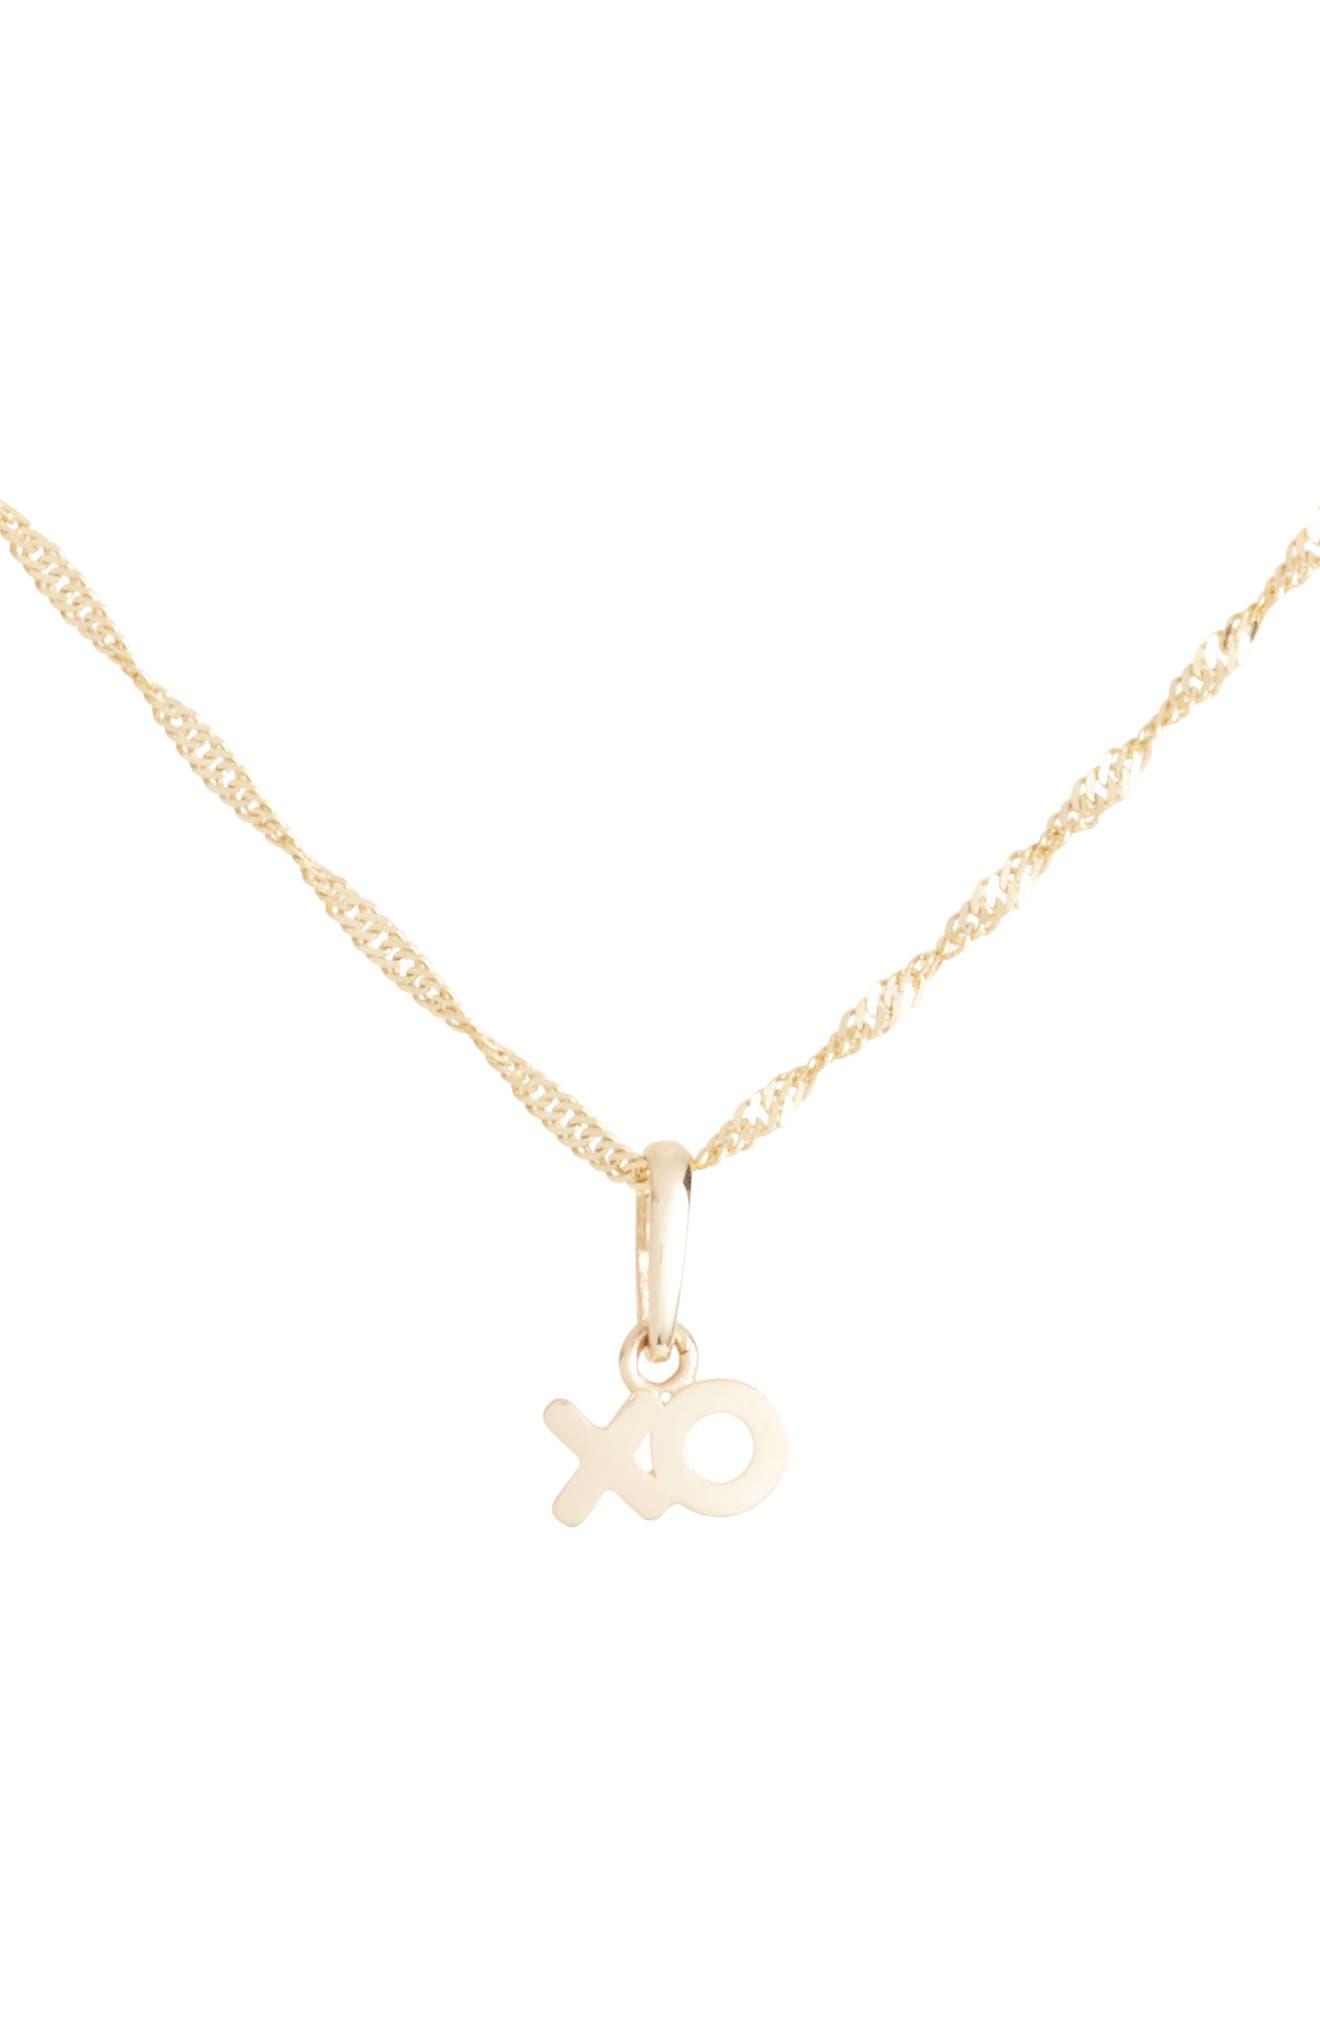 XO Charm Short Pendant Necklace,                             Main thumbnail 1, color,                             Yellow Gold